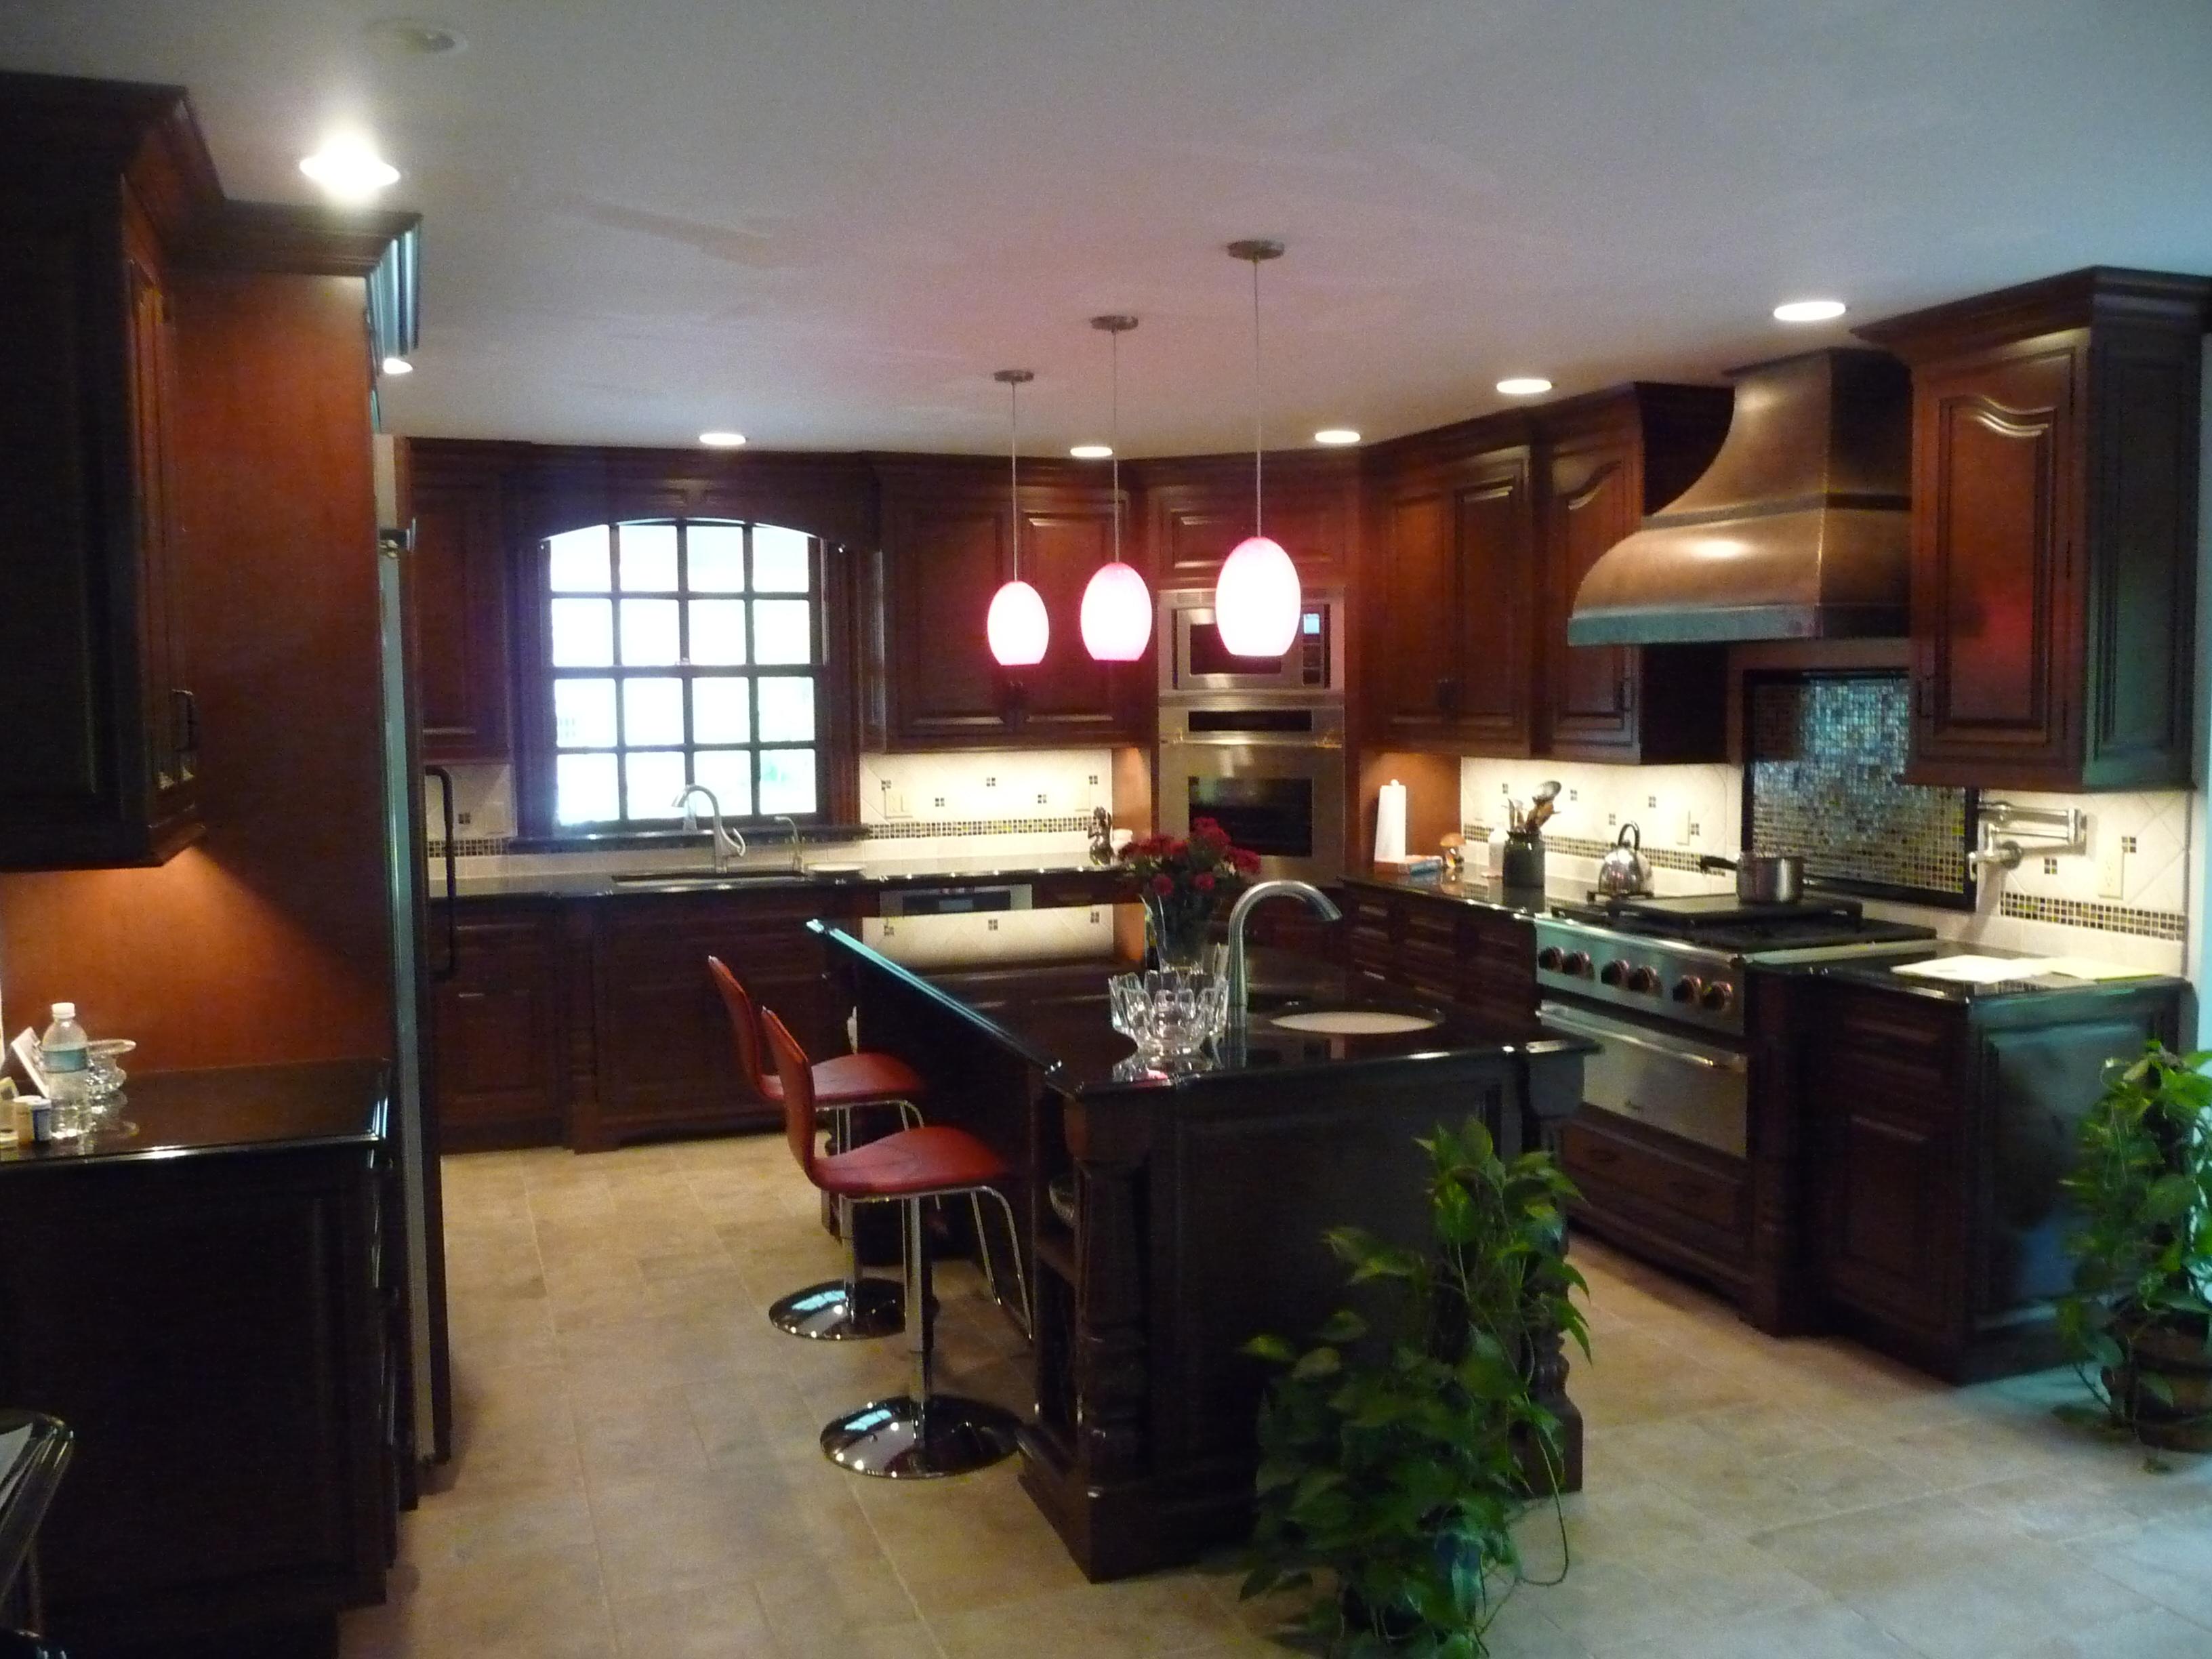 completed kitchen reniovation